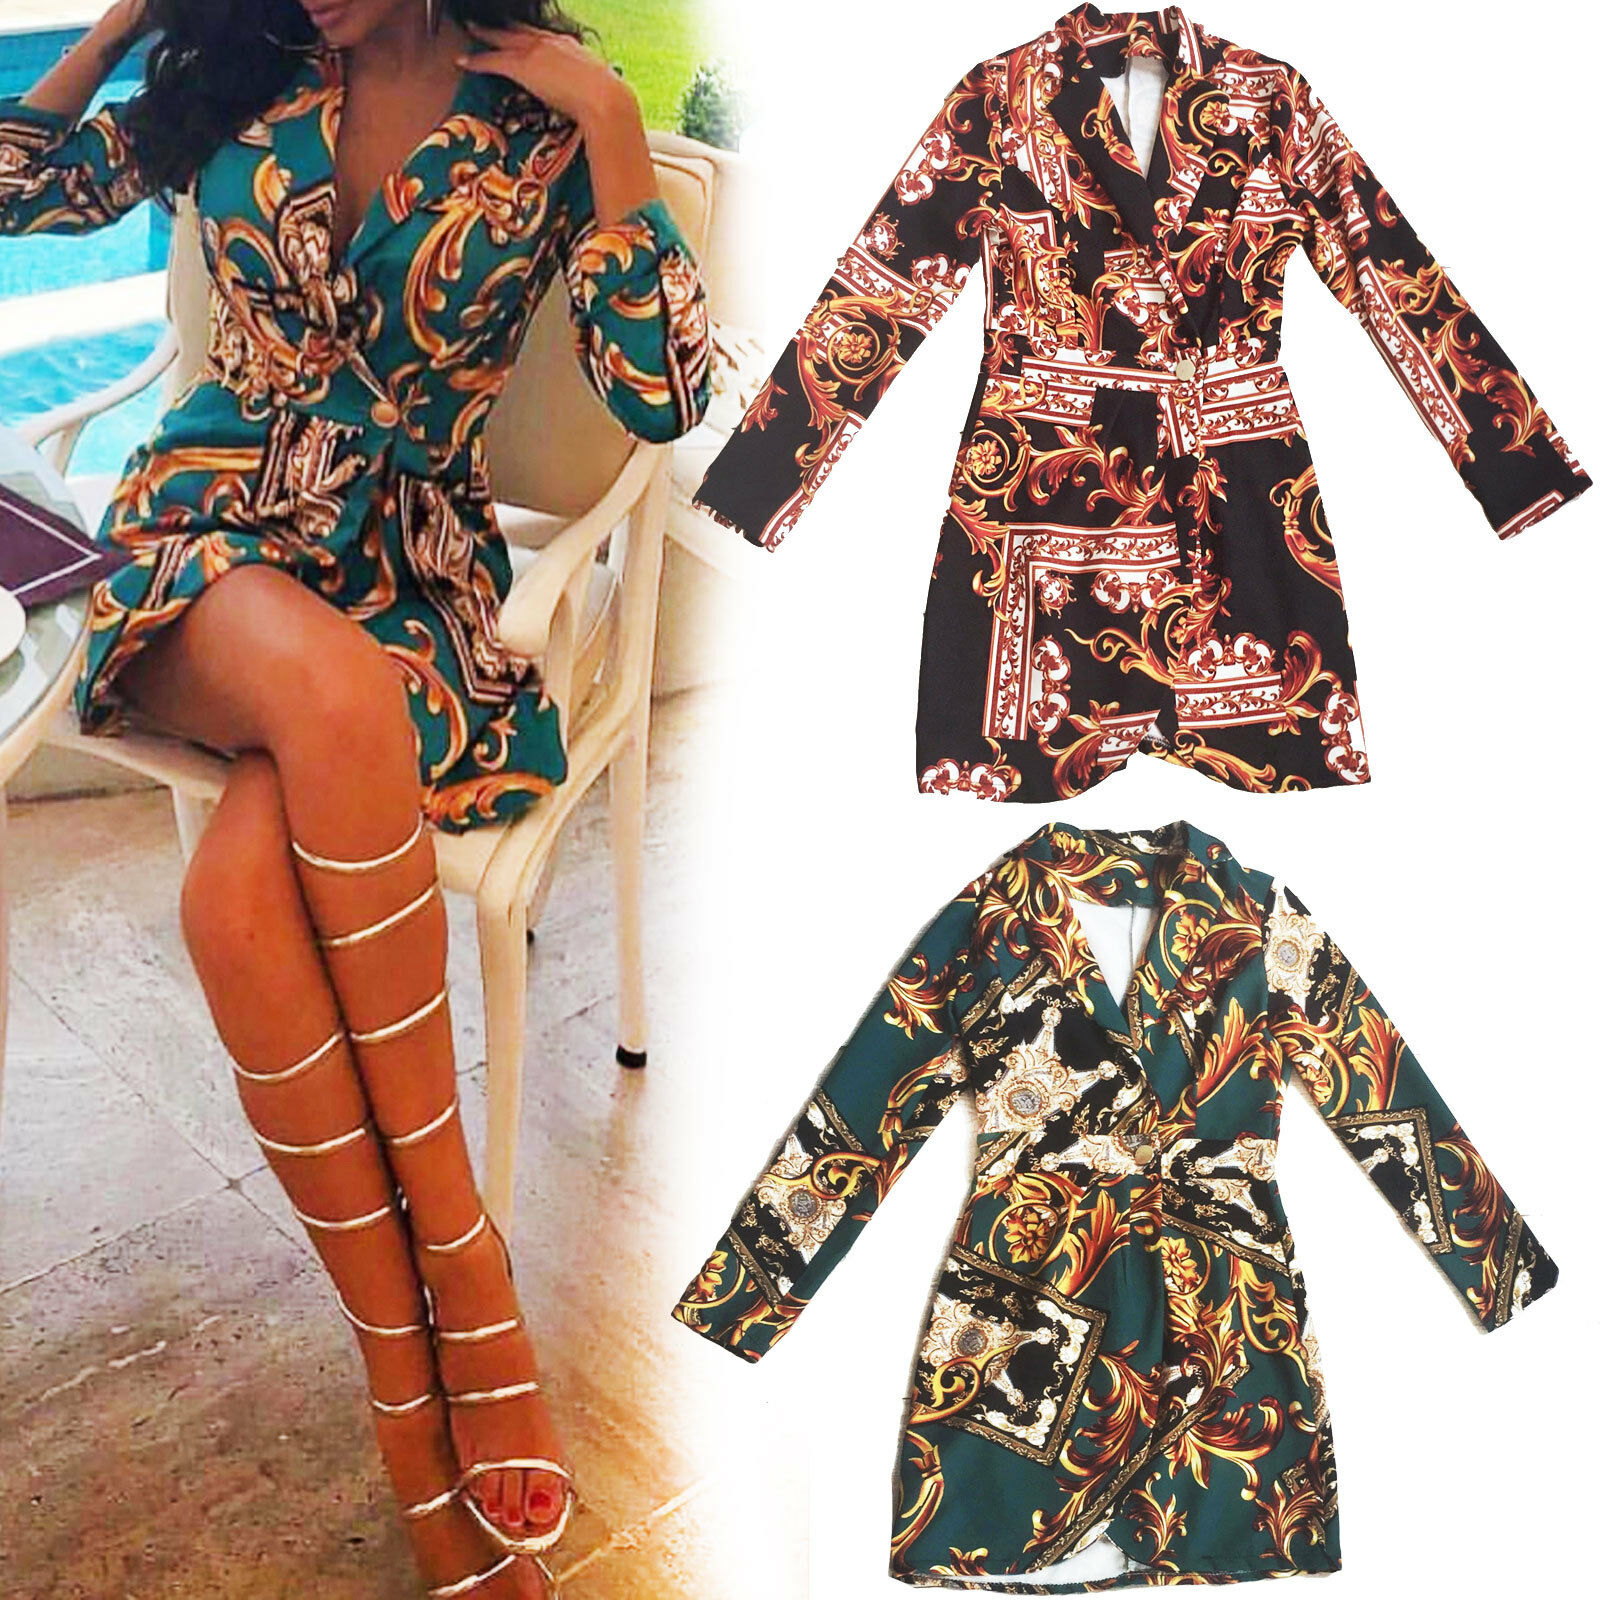 Kleid Frau Minikleid Buttons zweireihig angepasst élégant barocco GI-20628